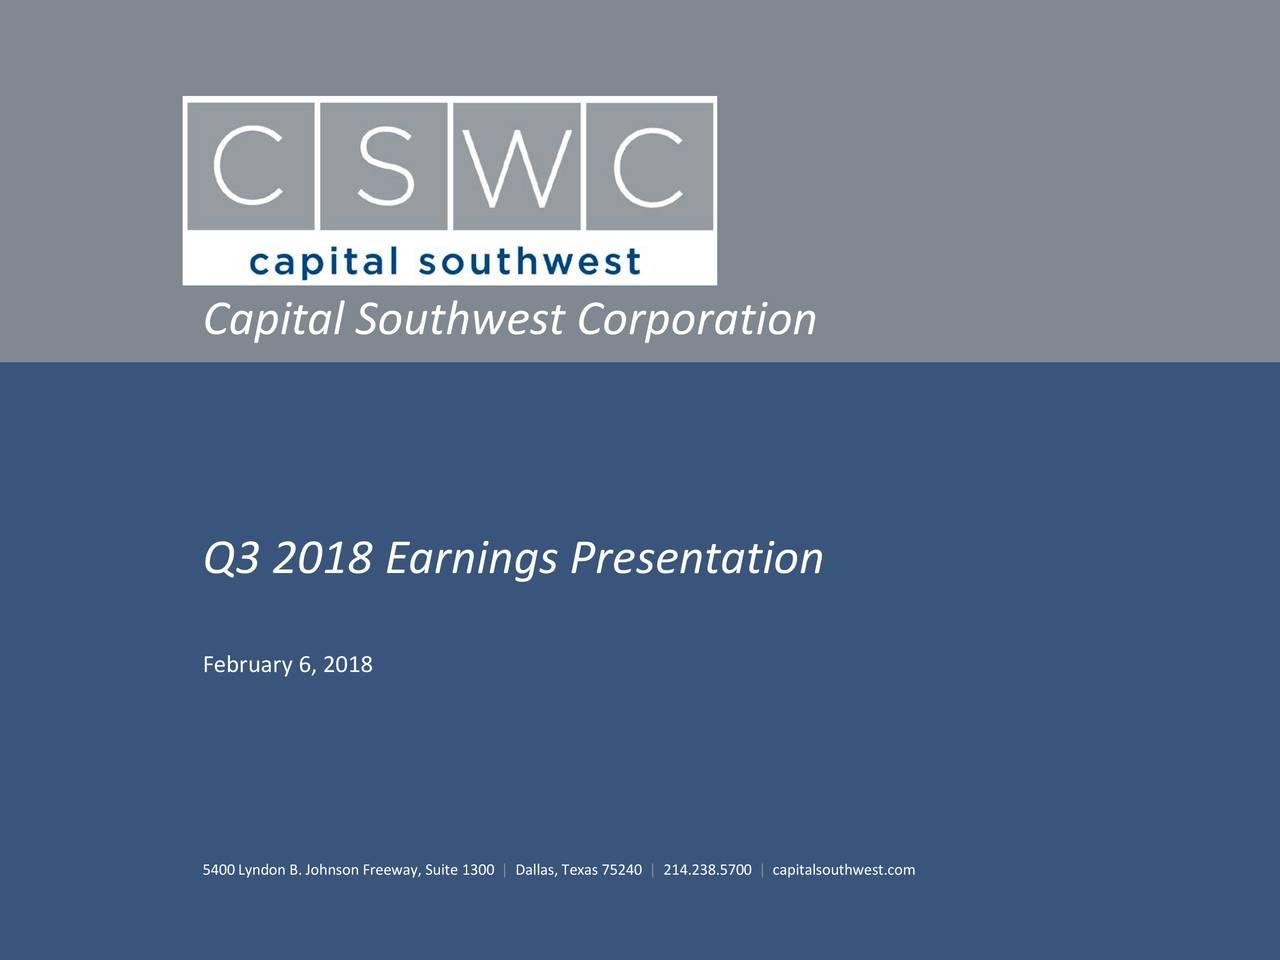 Q3 2018 Earnings Presentation February 6, 2018 5400Lyndon B. Johnson Freeway, Suite 1300 | Dallas, Texas 75240 | 214.238.5700 | capitalsouthwest.com